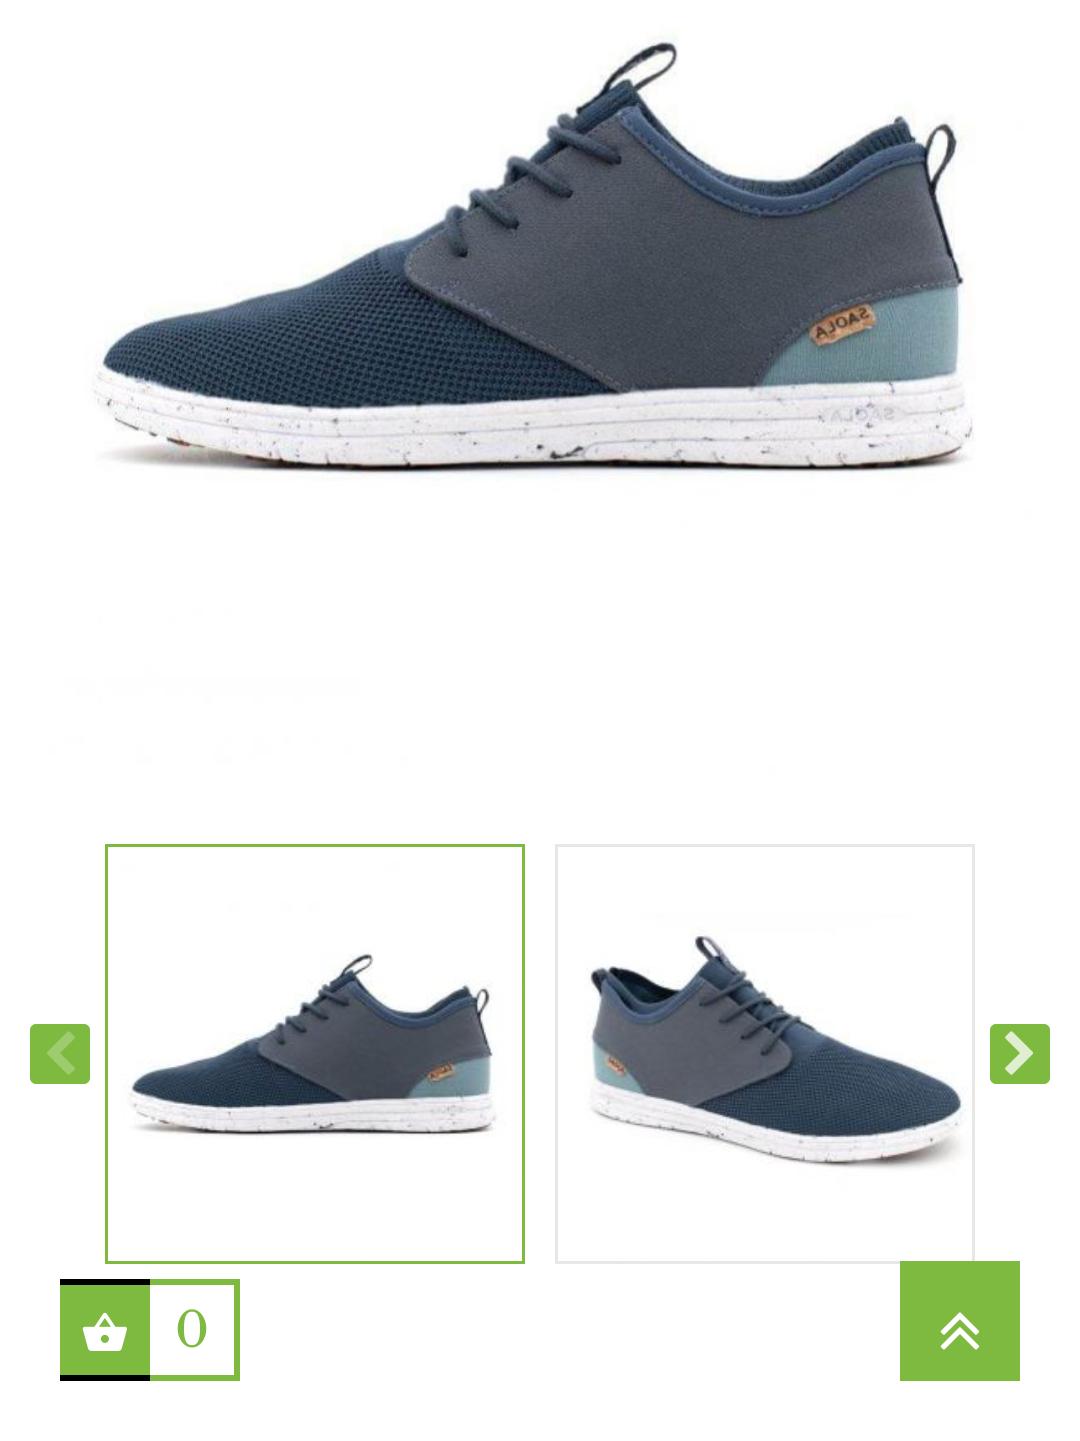 anifree-shoes.de 20% auf alles: Schuhe, Sneaker, Boots etc. vegan, recycled etc.